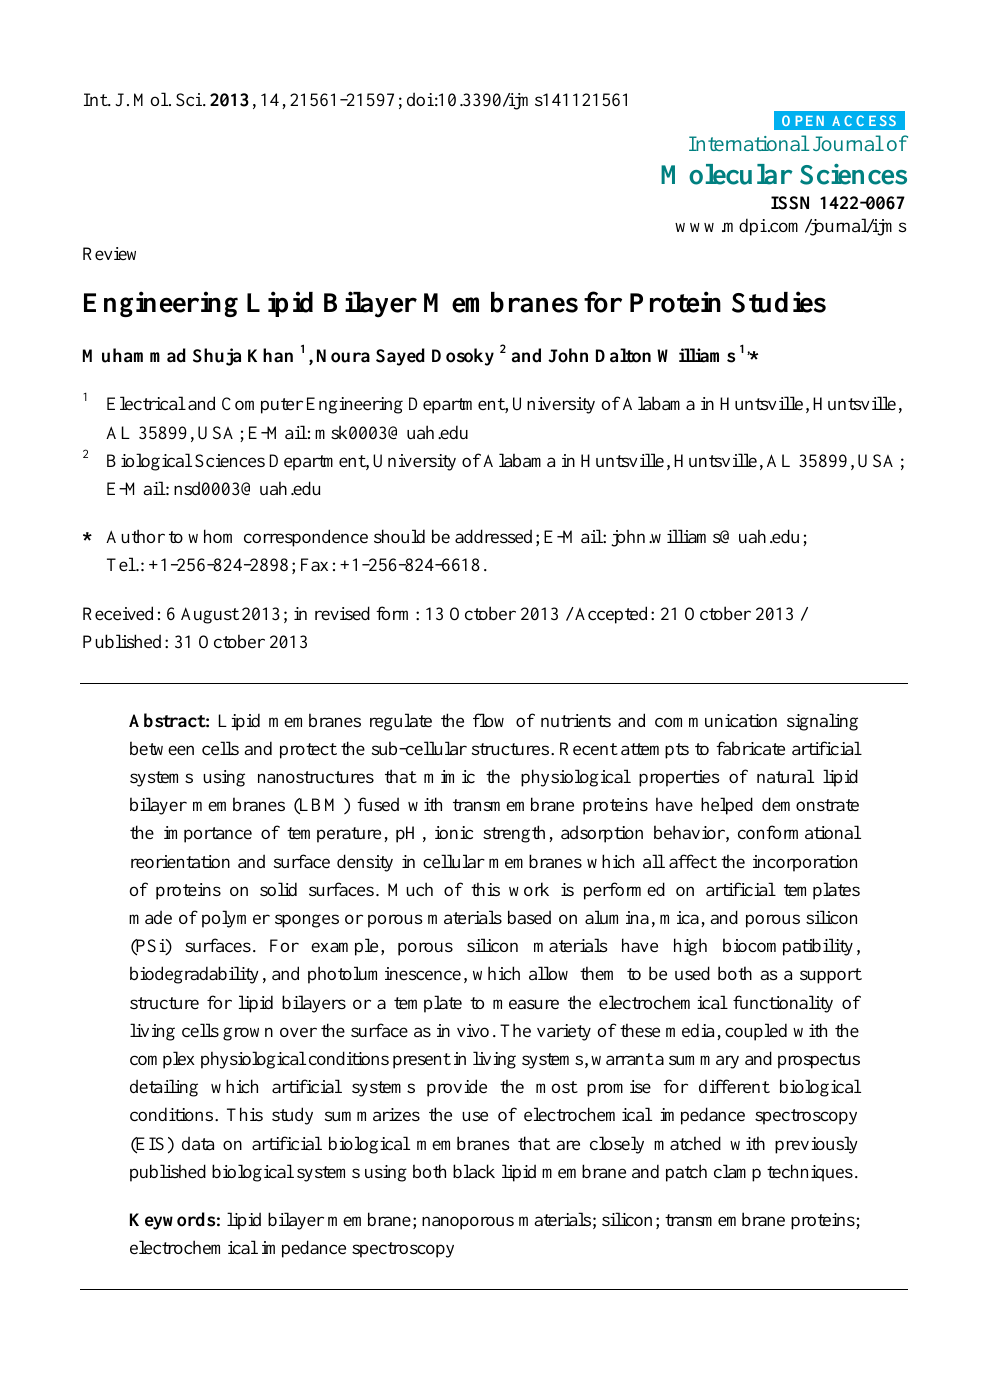 Angelika Baumgart engineering lipid bilayer membranes for protein studies